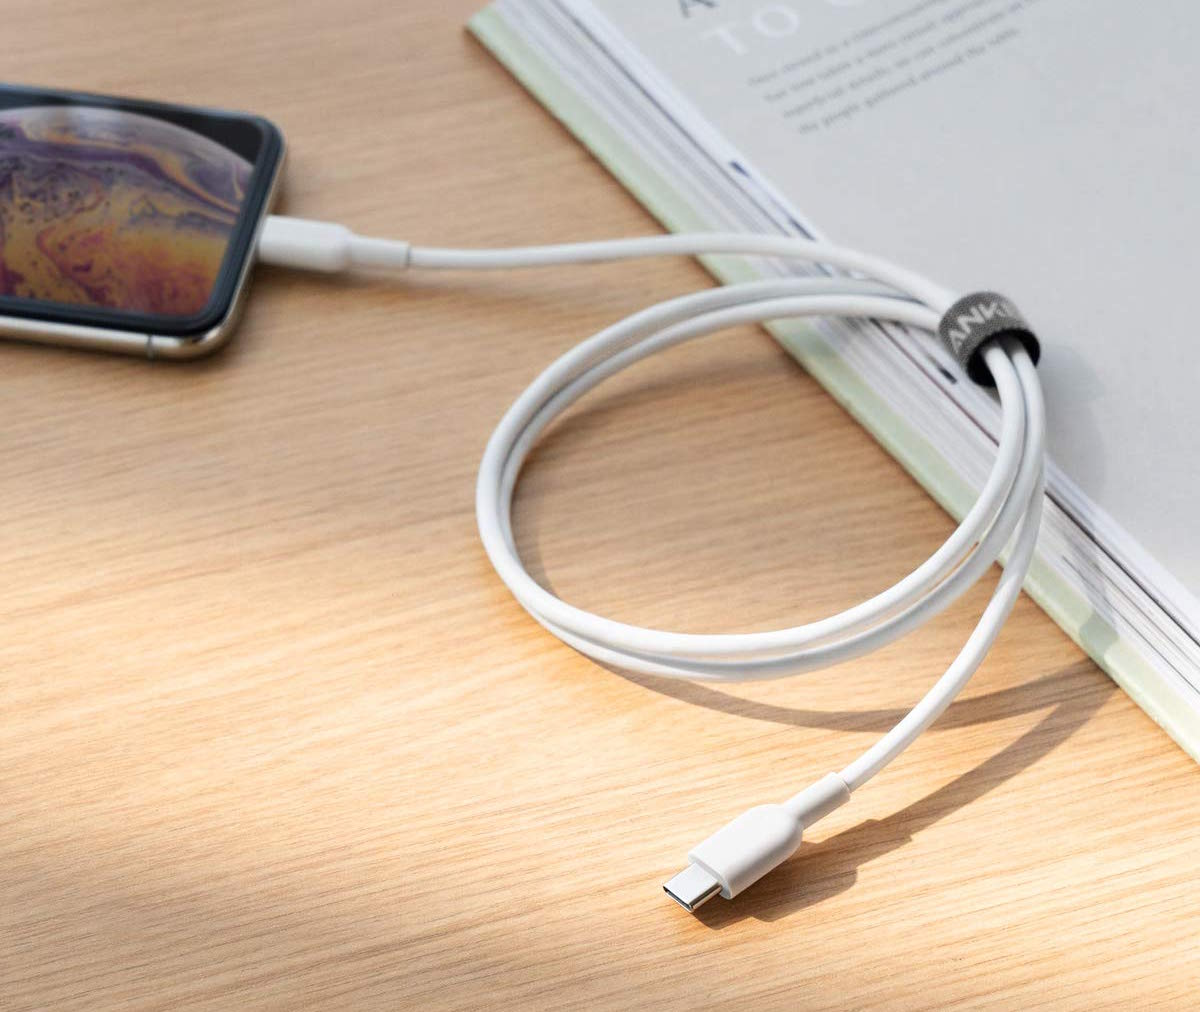 Cavo Lightning USB-C certificato Apple in sconto a 14,39 euro